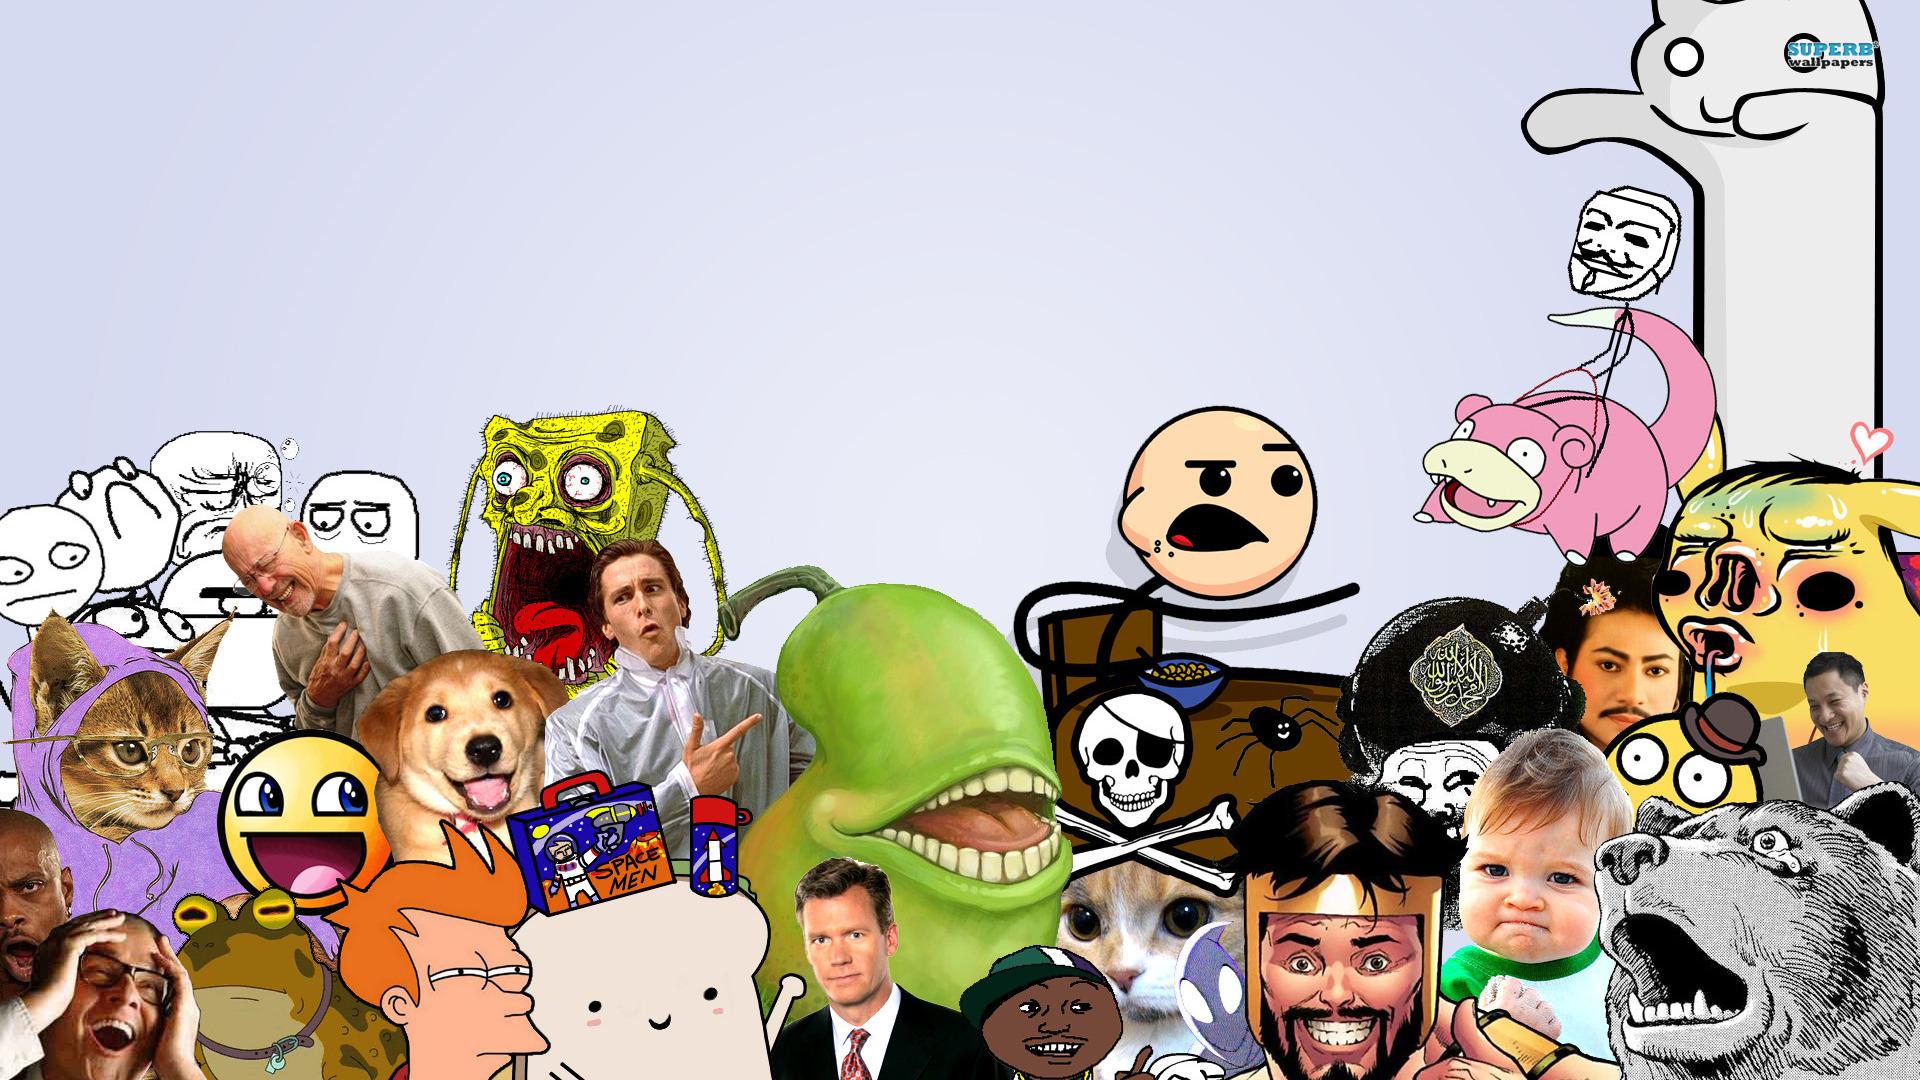 Meme Wallpaper  Memes 30218798 Fanpop